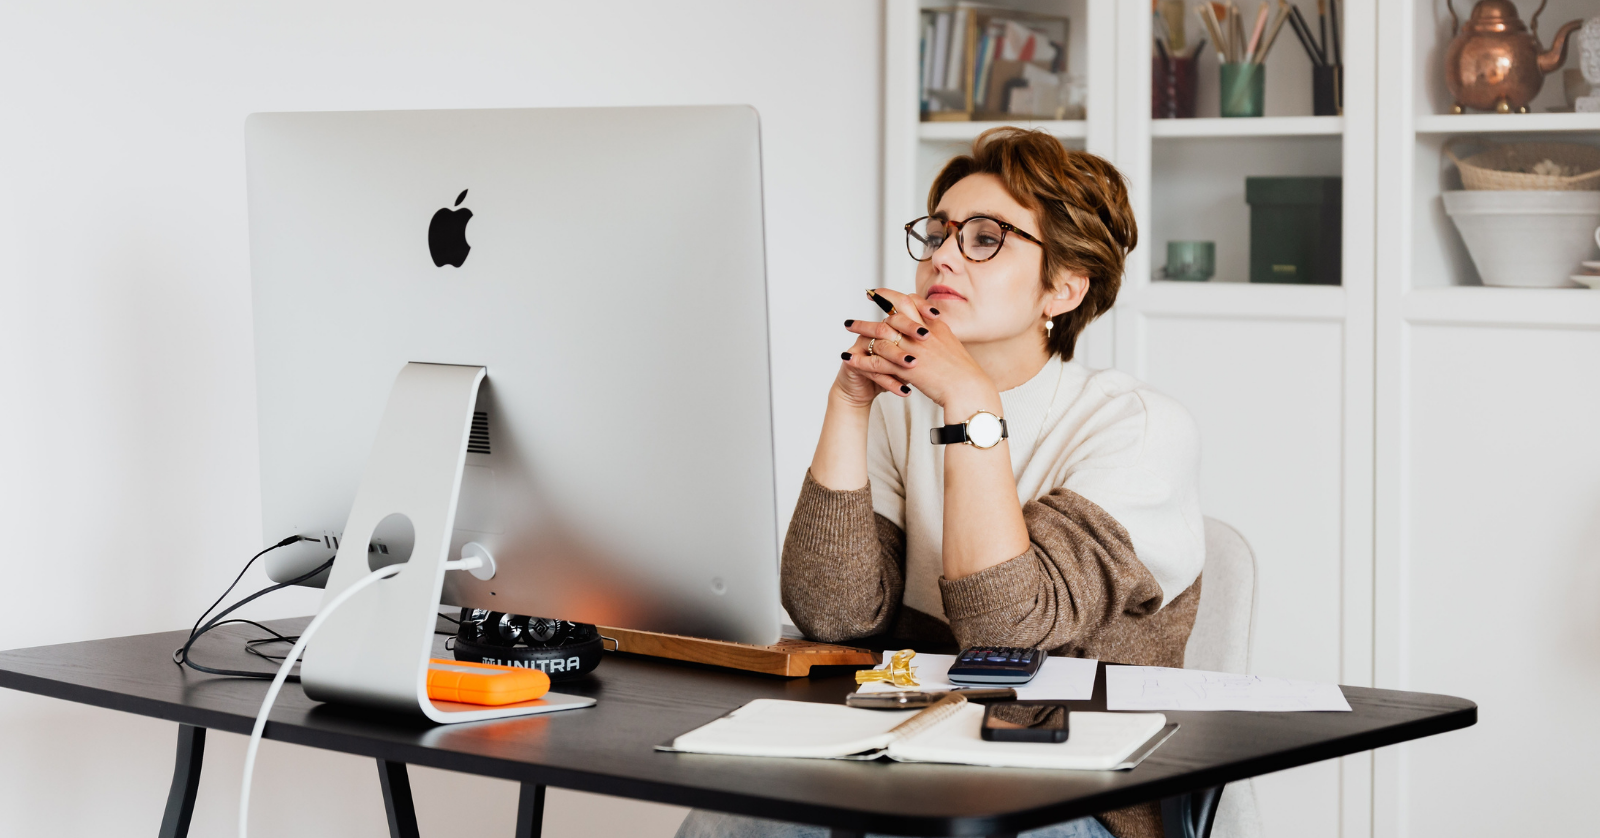 Síndrome da Mulher Maravilha e os impactos no empreendedorismo